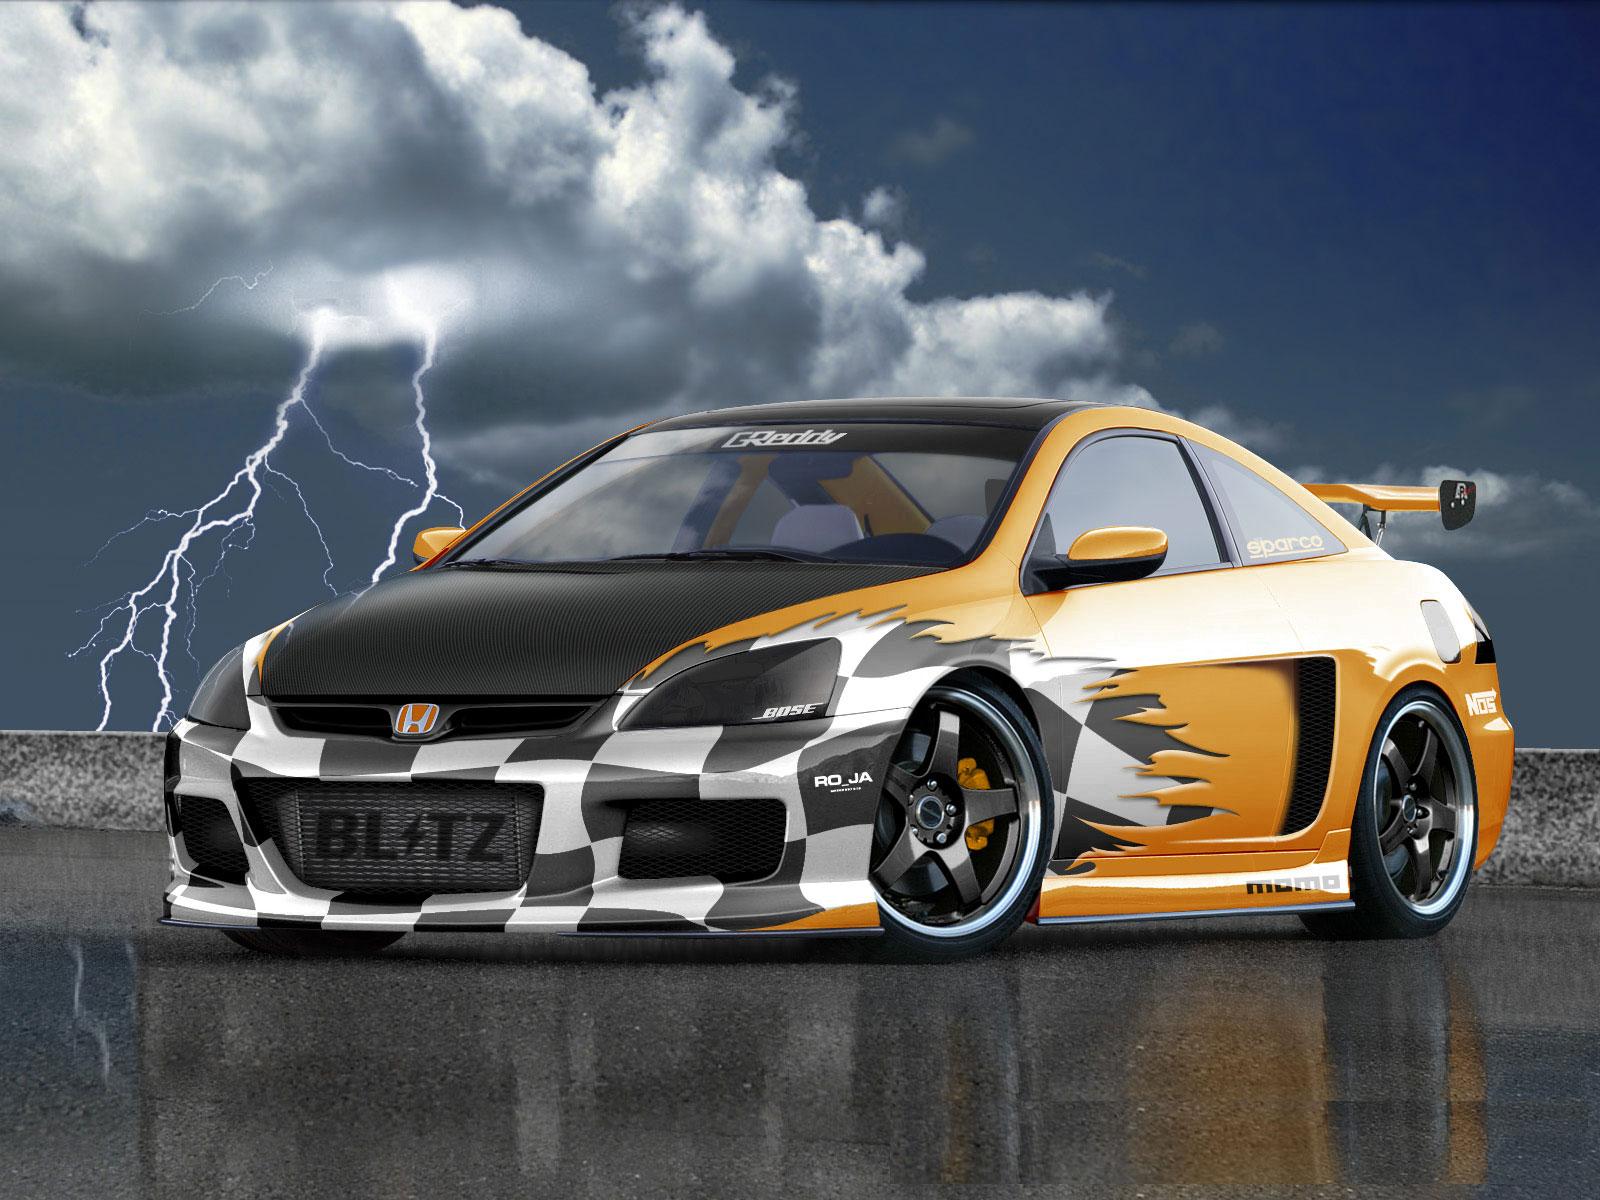 cool sports car wallpaper Cool Car Wallpapers 1600x1200